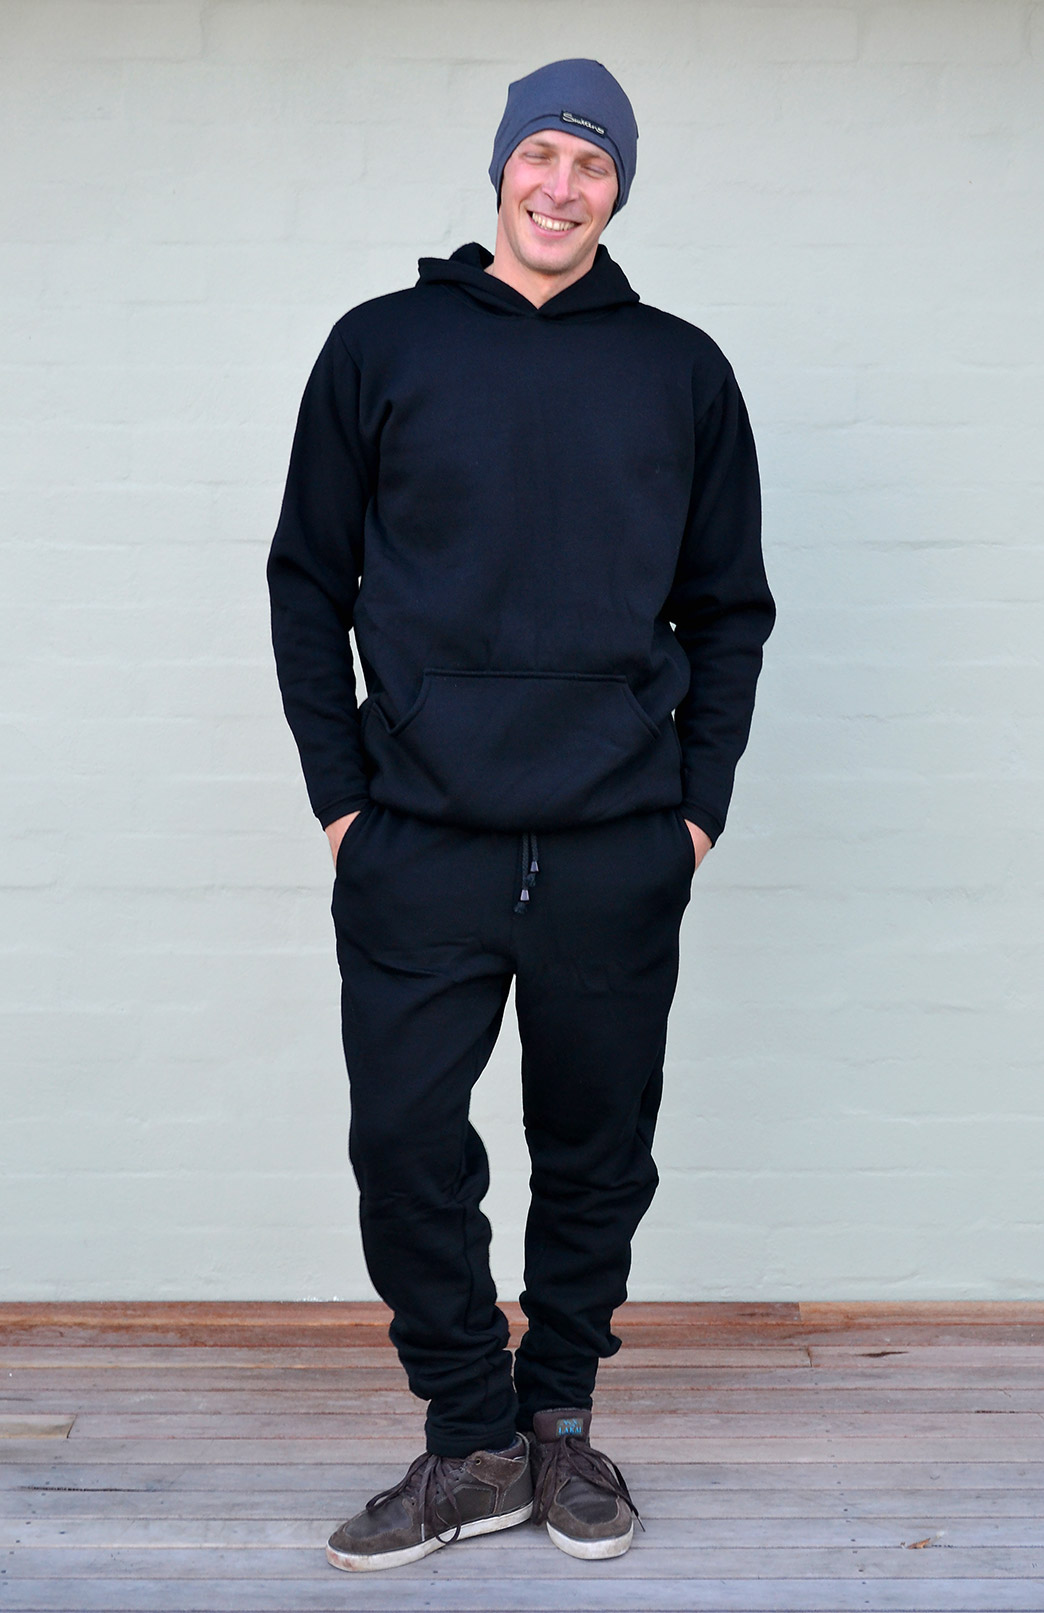 Men's Wool Fleece Track Pants - 350g - Men's Black Merino Wool Fleece Track Pants Joggers - Smitten Merino Tasmania Australia